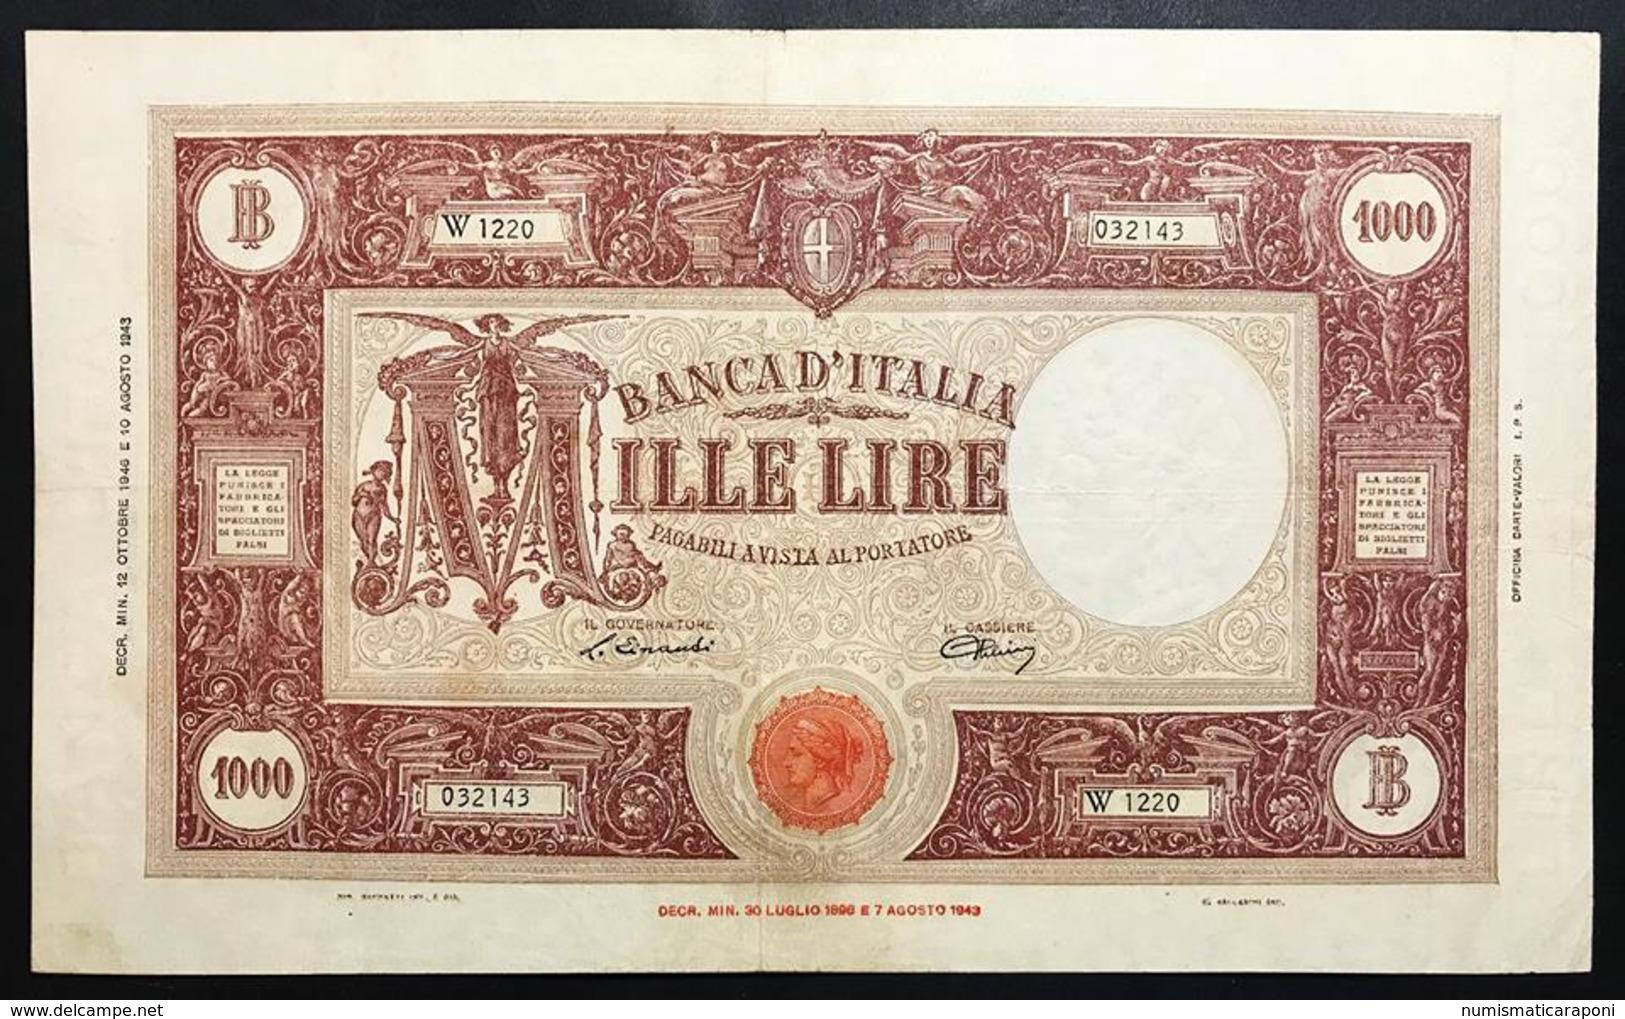 1000 Lire Grande M Testina B.I.12 10 1946 Bel BB Naturale  LOTTO 2300 - 1000 Lire